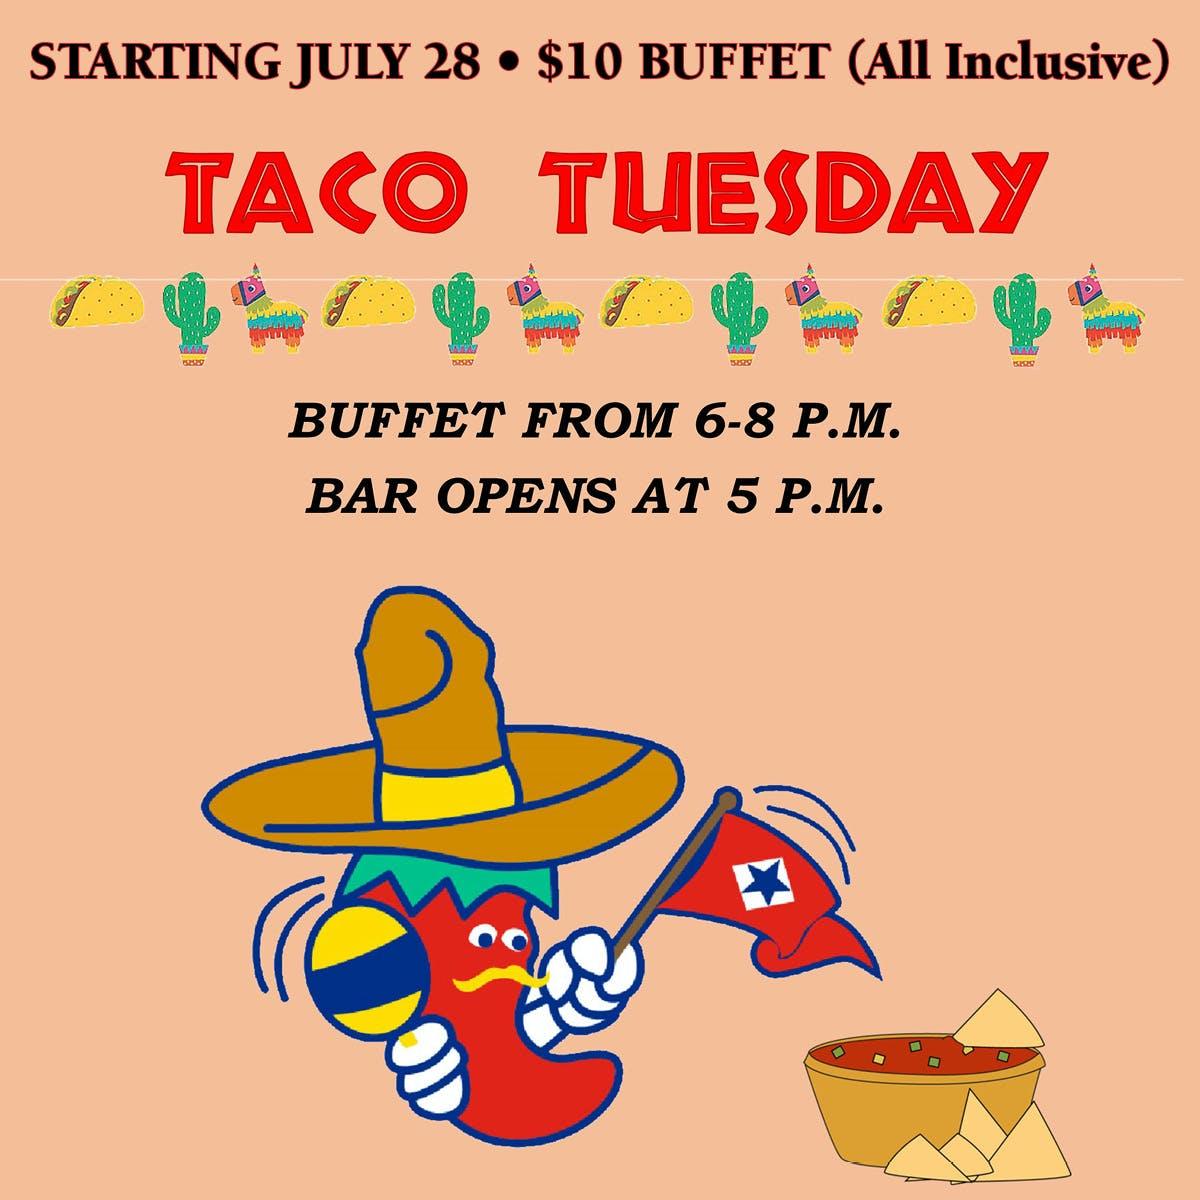 Taco Tuesday Buffet